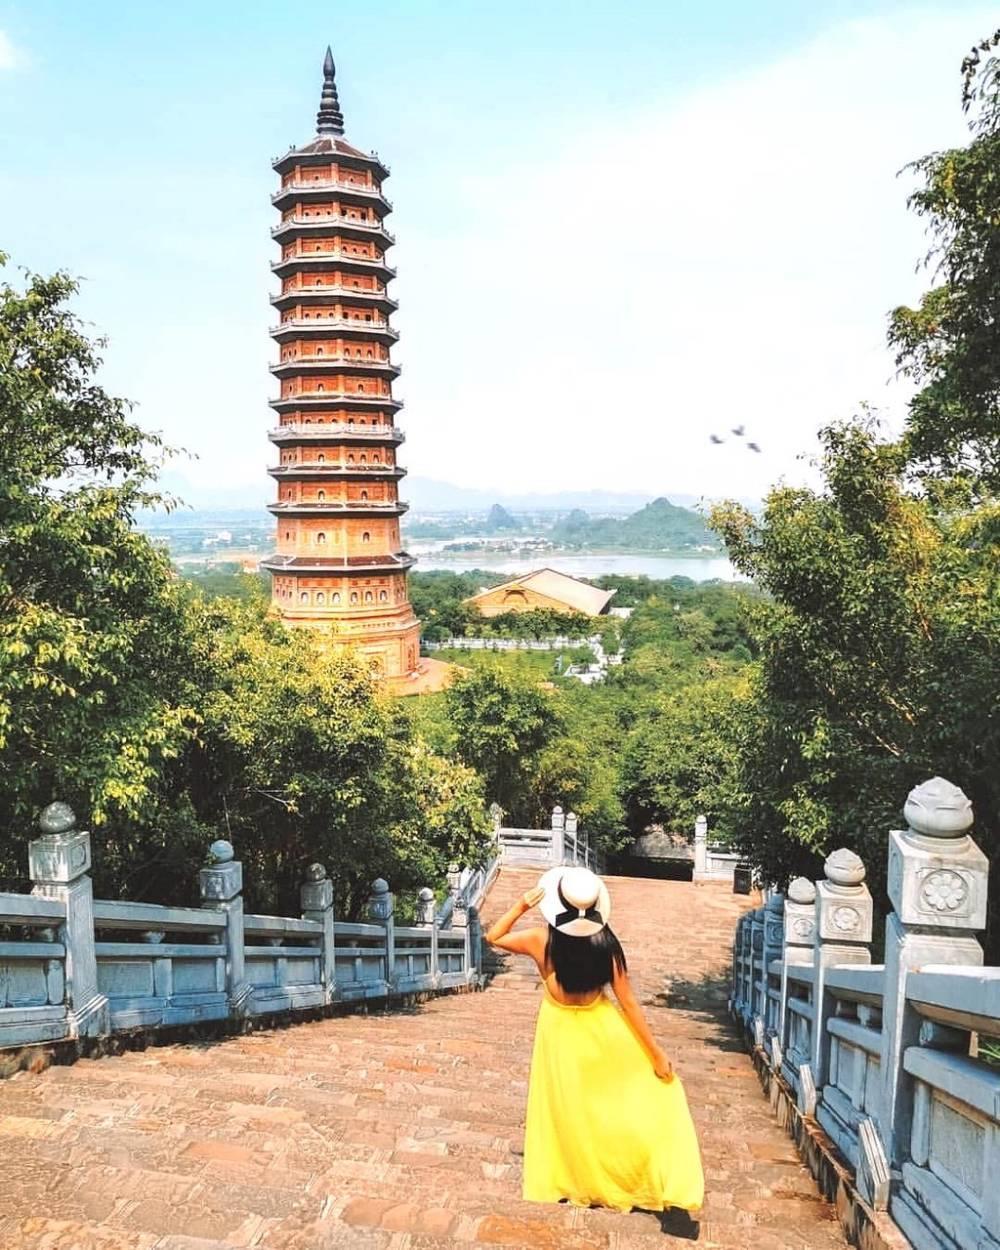 Discover the beauty of Bai Dinh Ninh Binh Pagoda